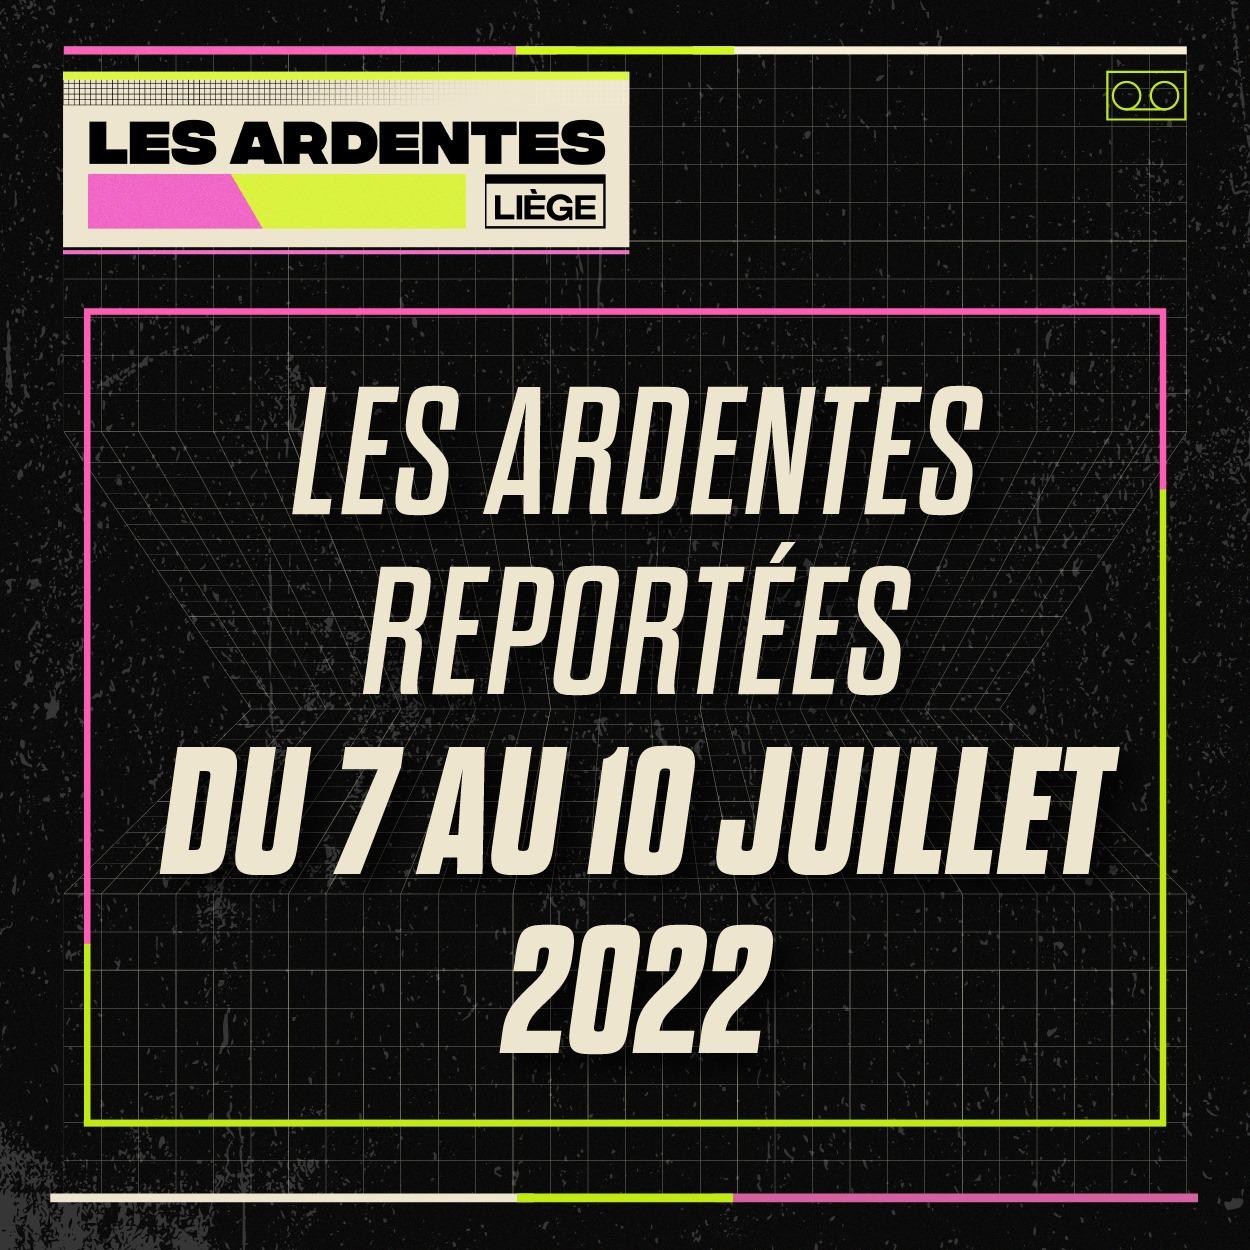 Les Ardentes Belgium July 2022